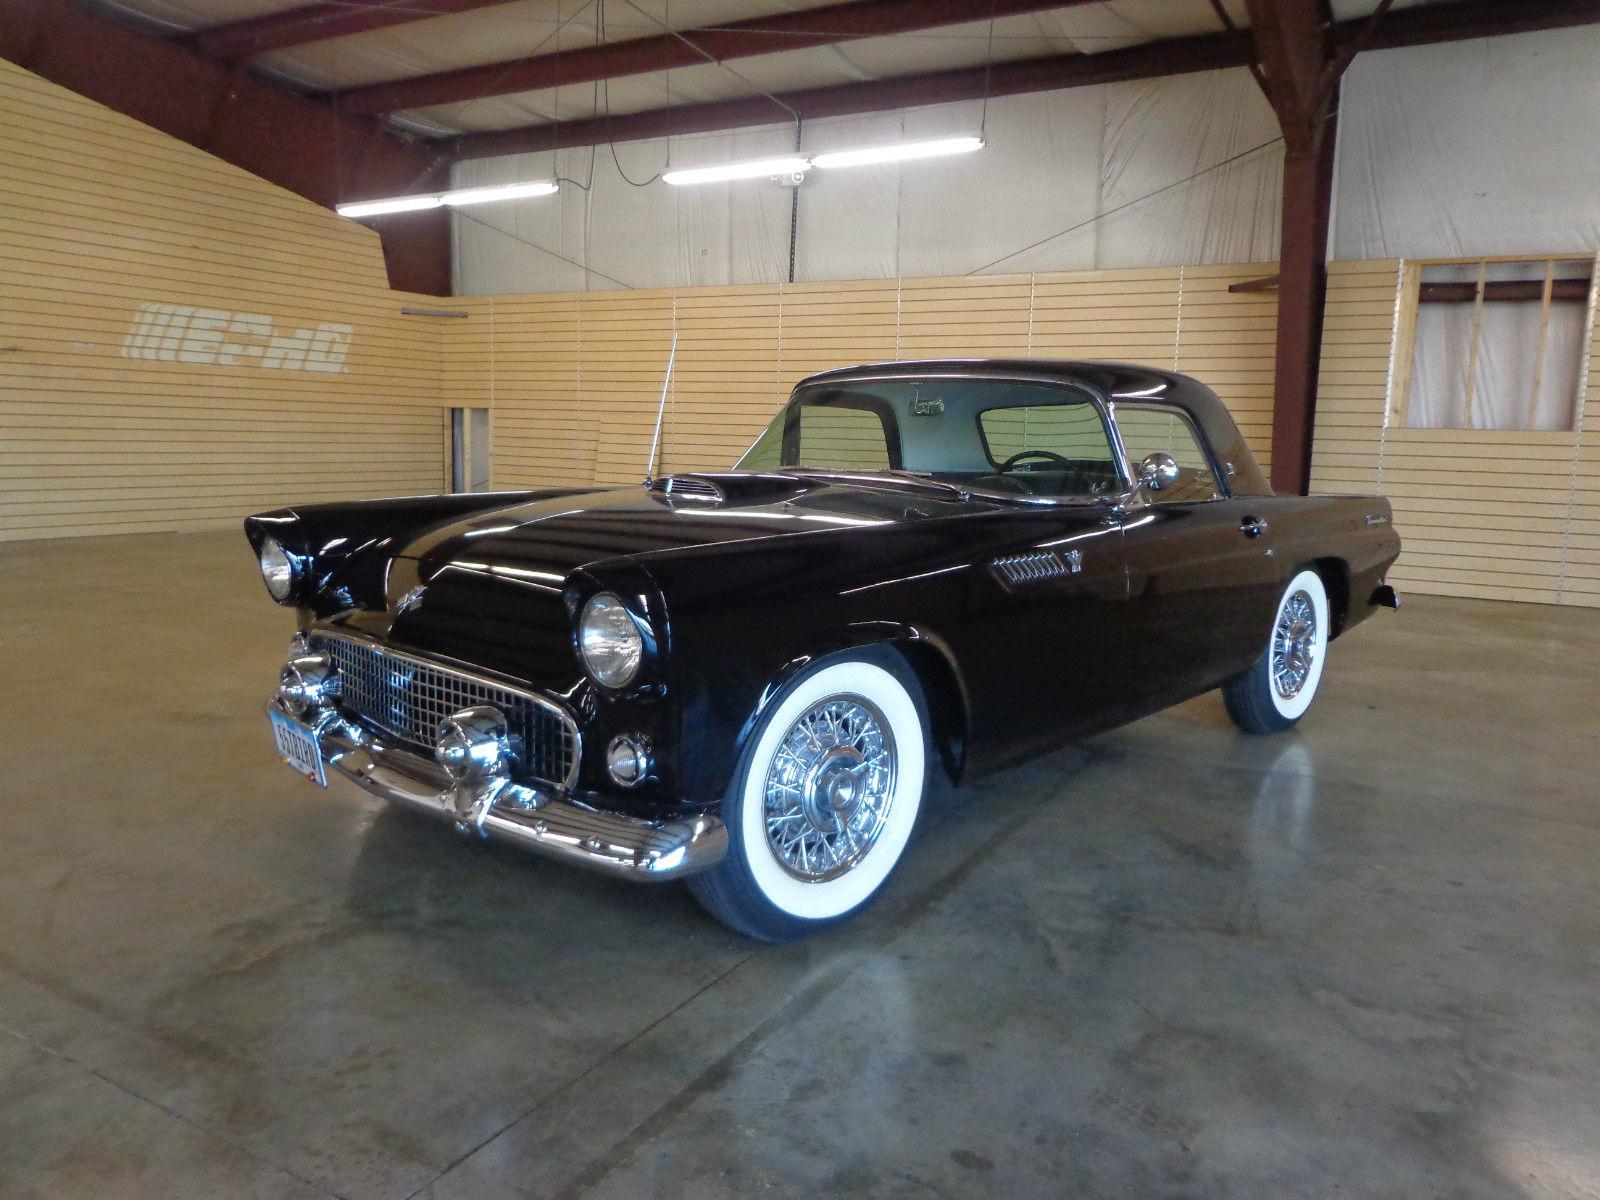 1955 ford thunderbird hardtop convertible 3 speed manual transmission black. Black Bedroom Furniture Sets. Home Design Ideas